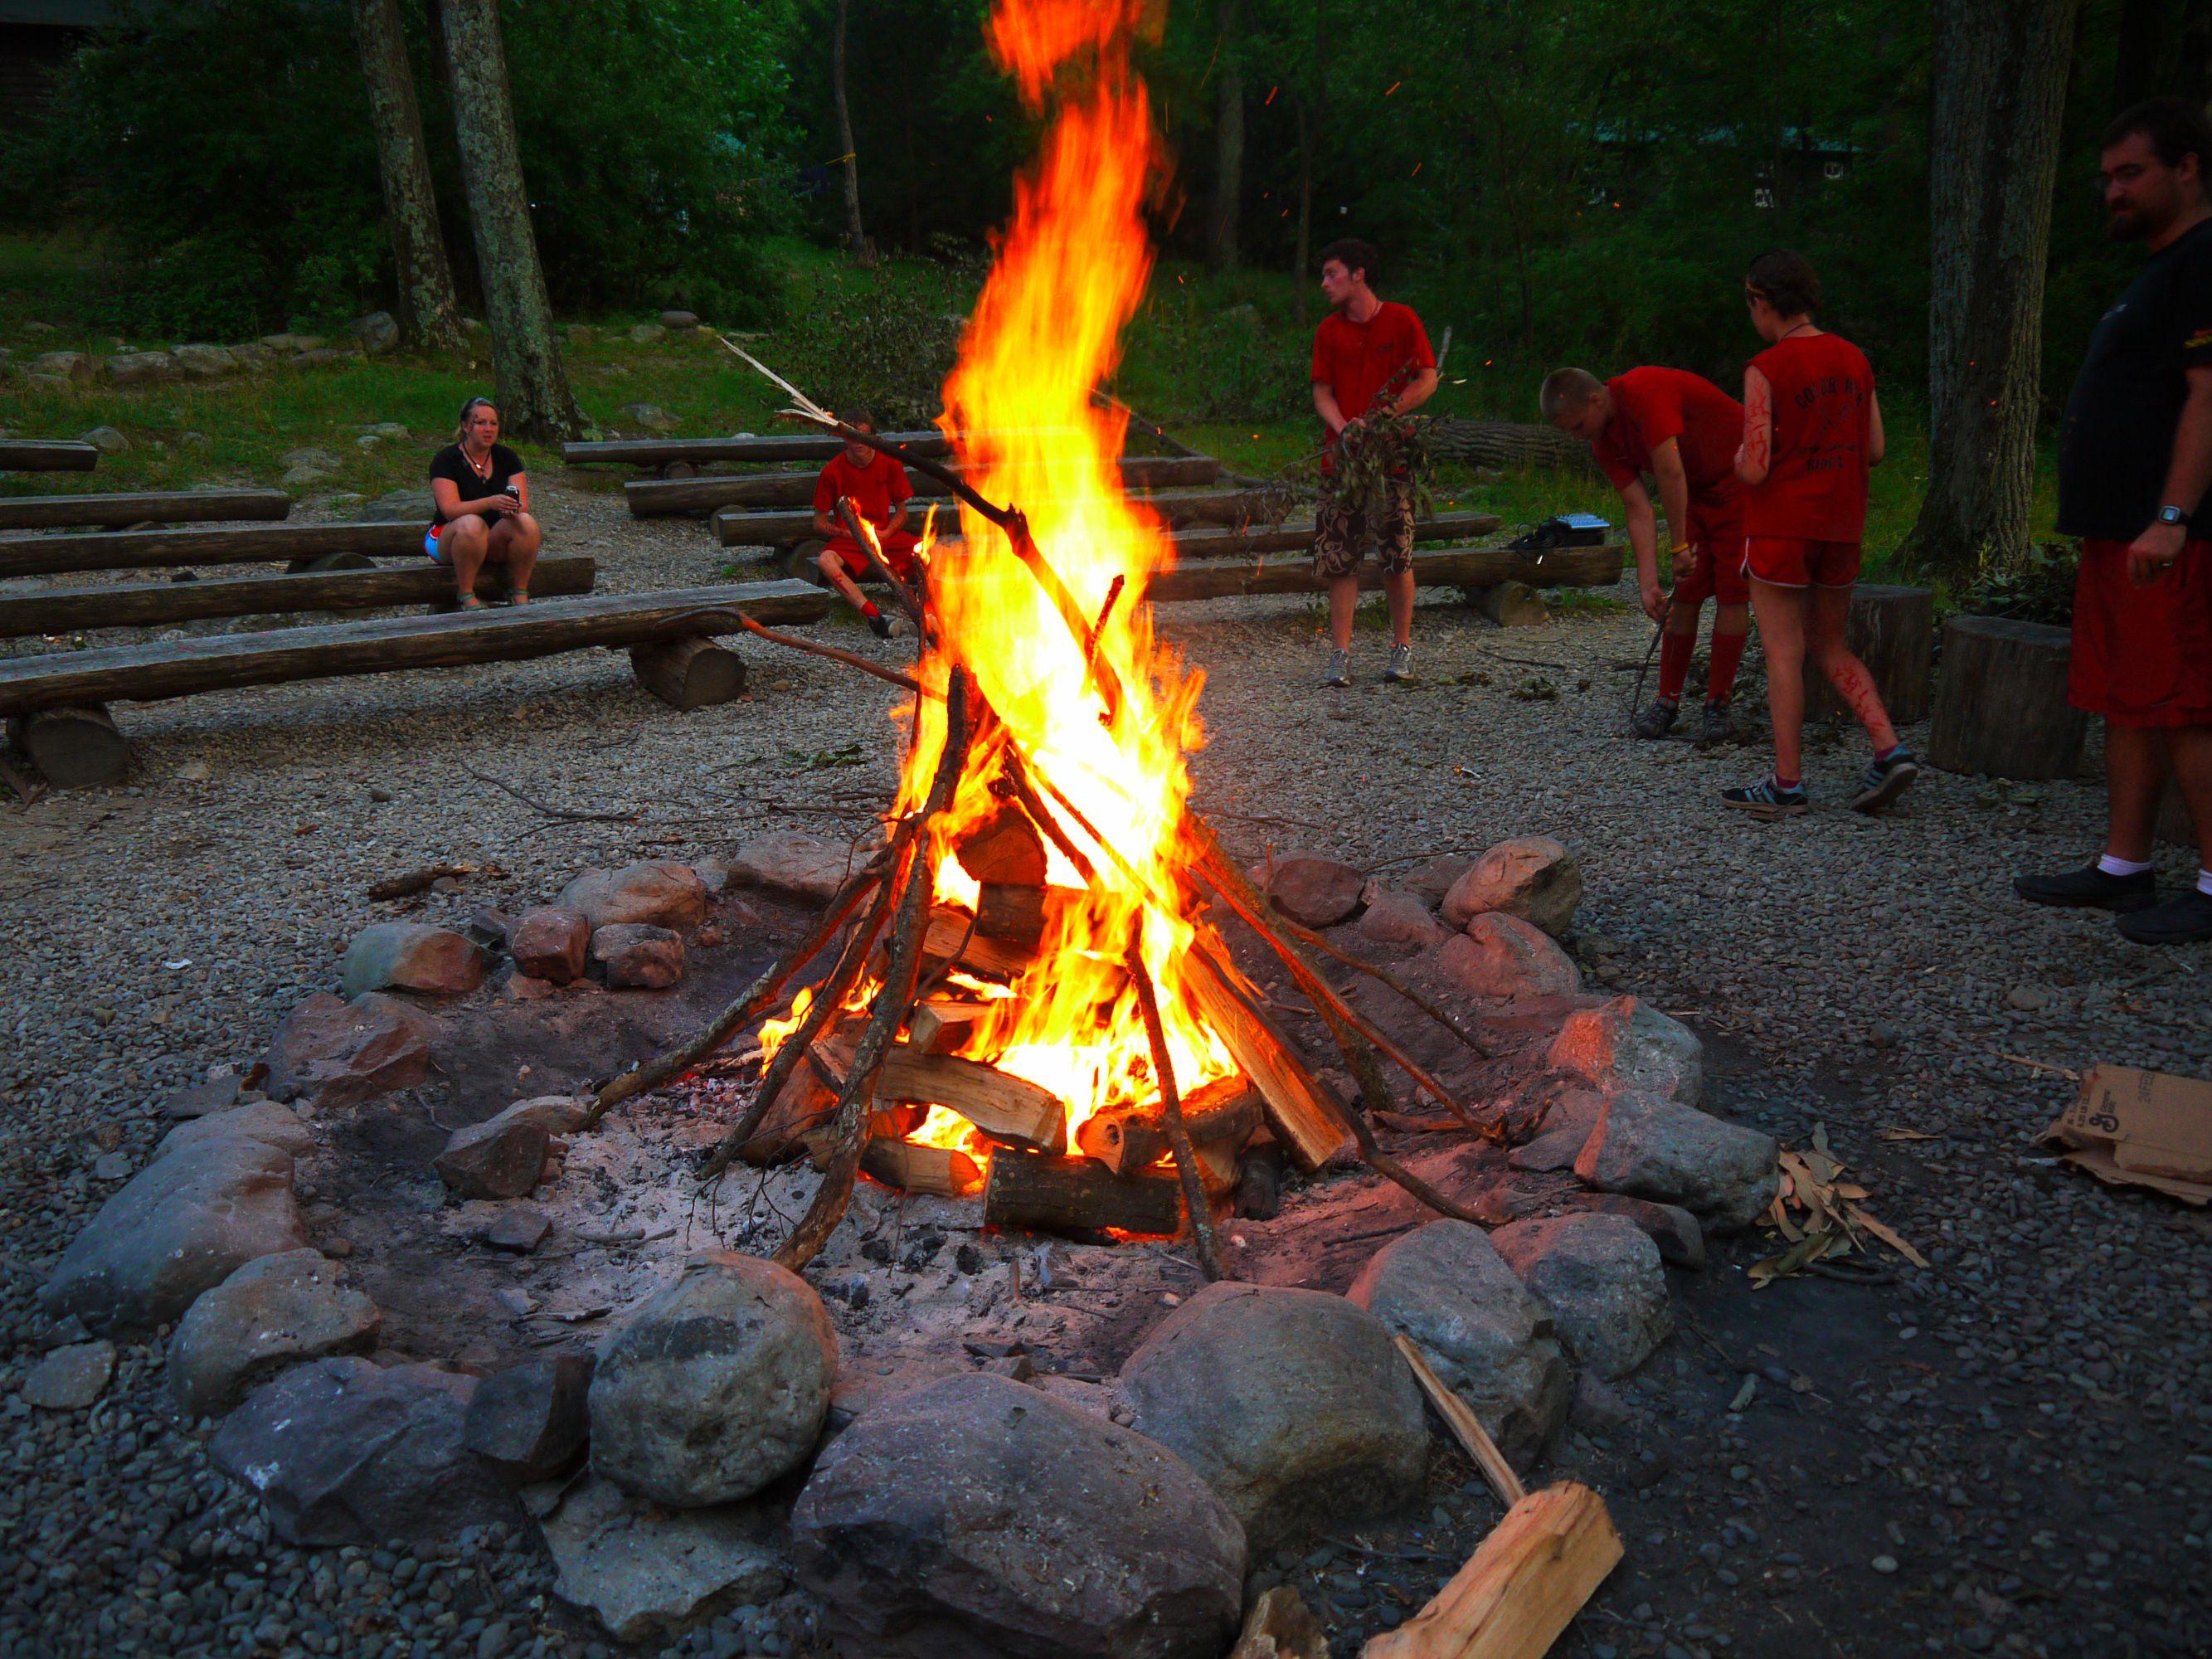 camp fire - photo #31